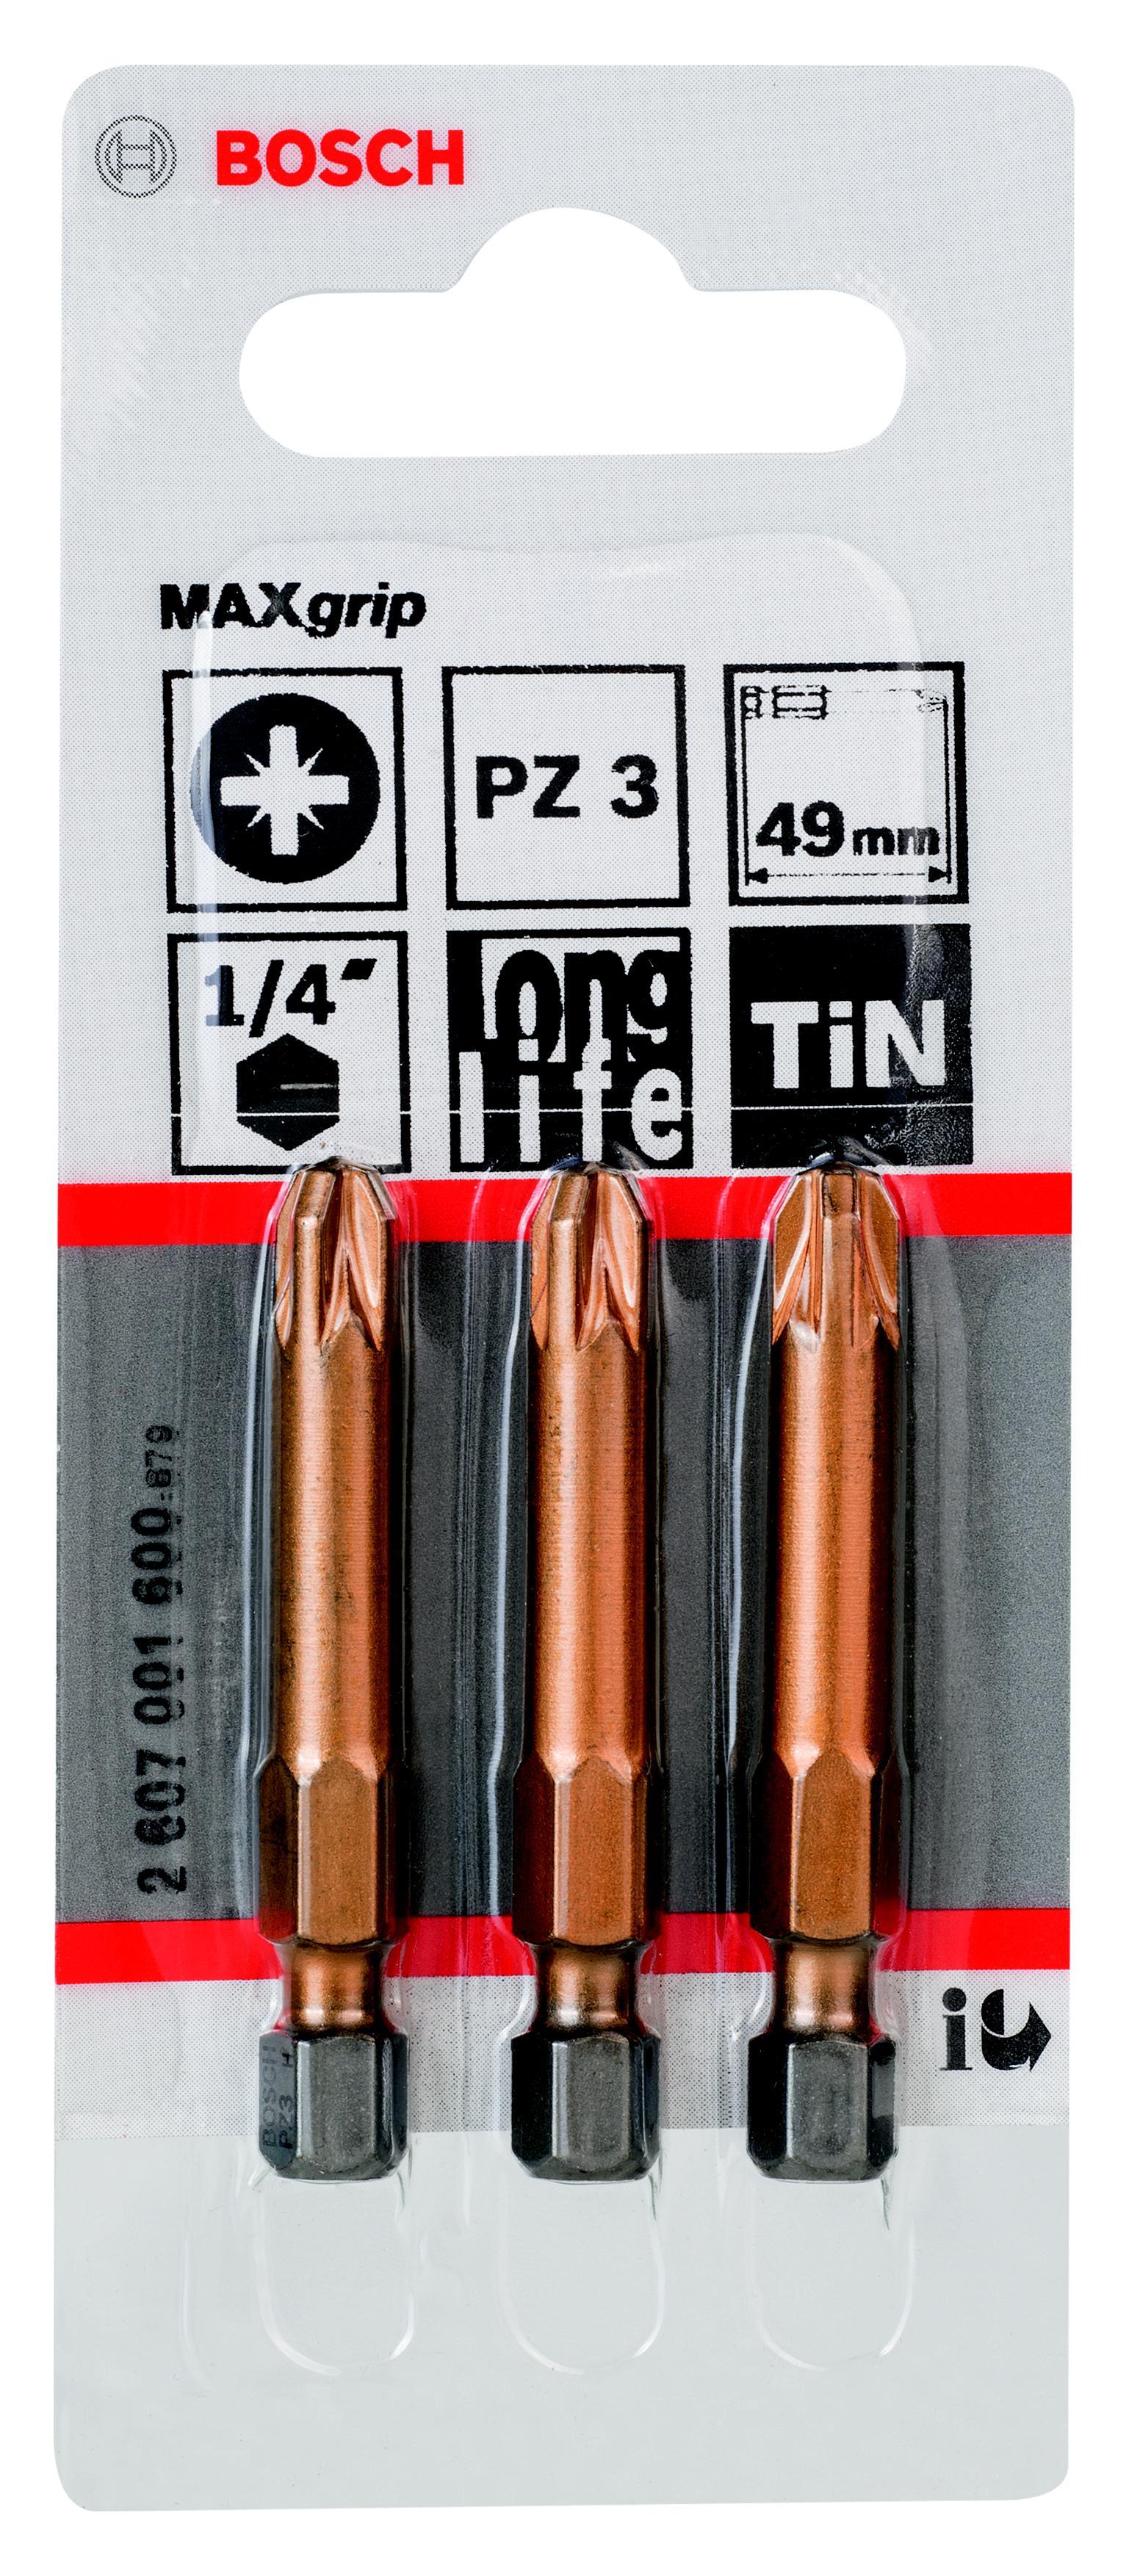 Бита Bosch Maxgrip pz3 49 мм, 3 шт. (2.607.001.600) бита рz1 49 мм 3 шт bosch профи